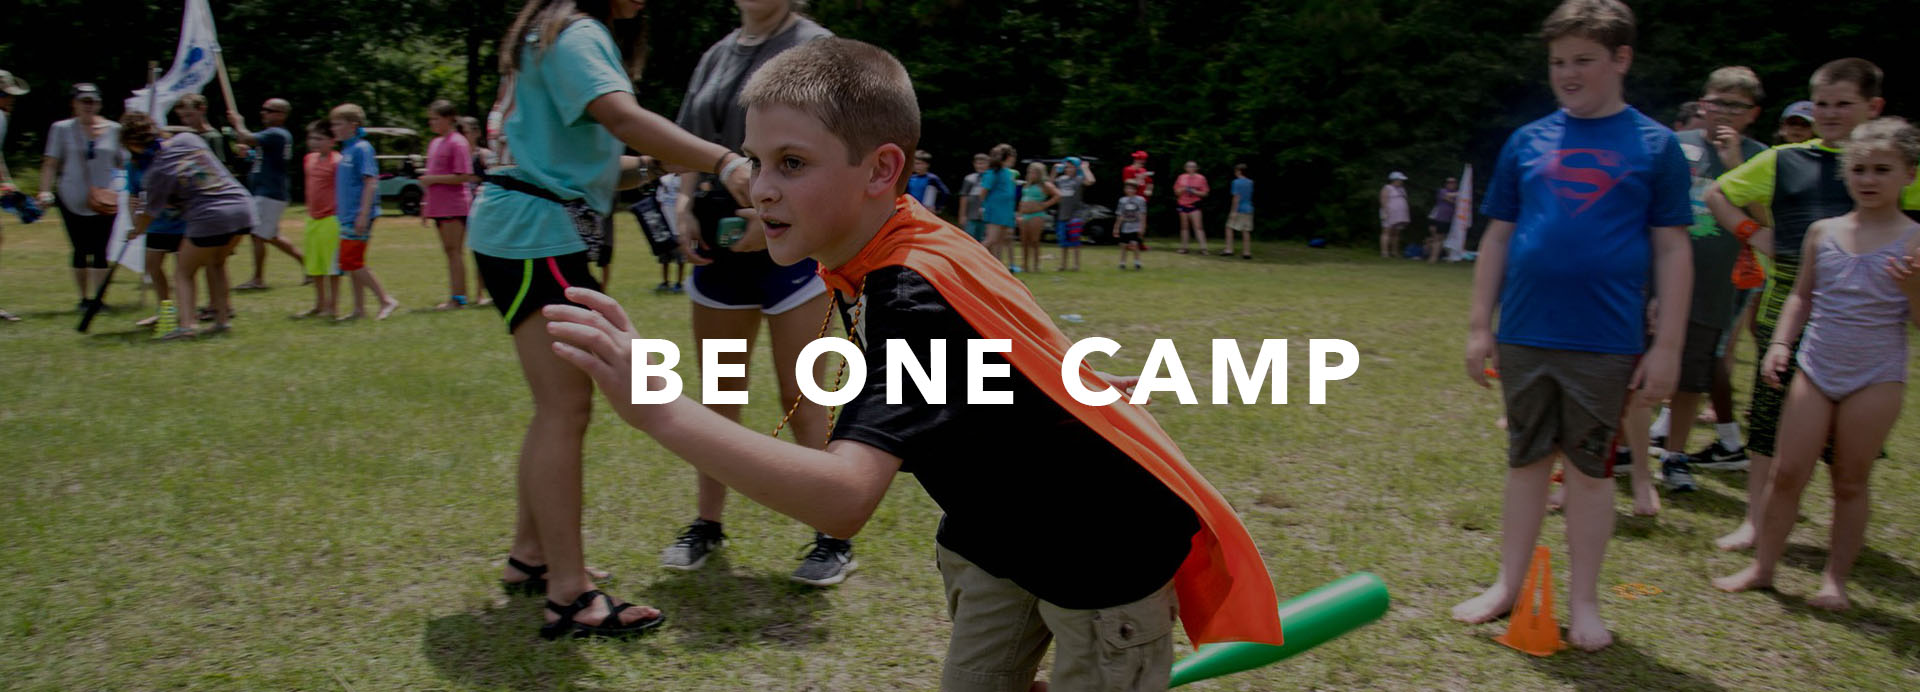 BE ONE camp.jpg